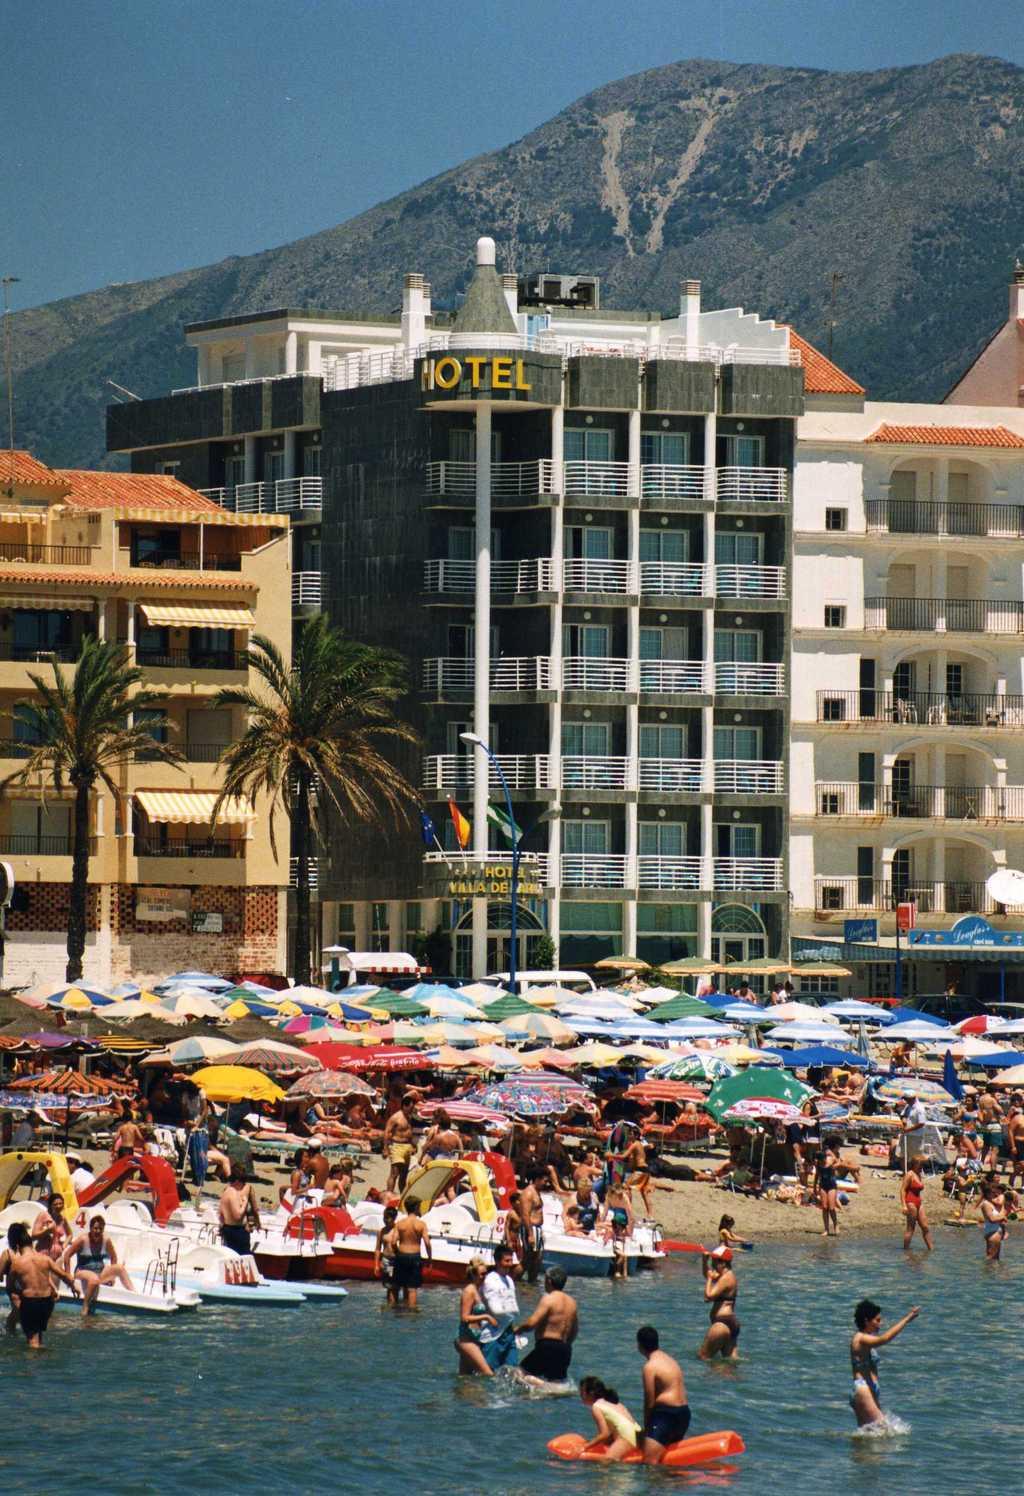 Hotel villa de laredo fuengirola spain for Hotel search